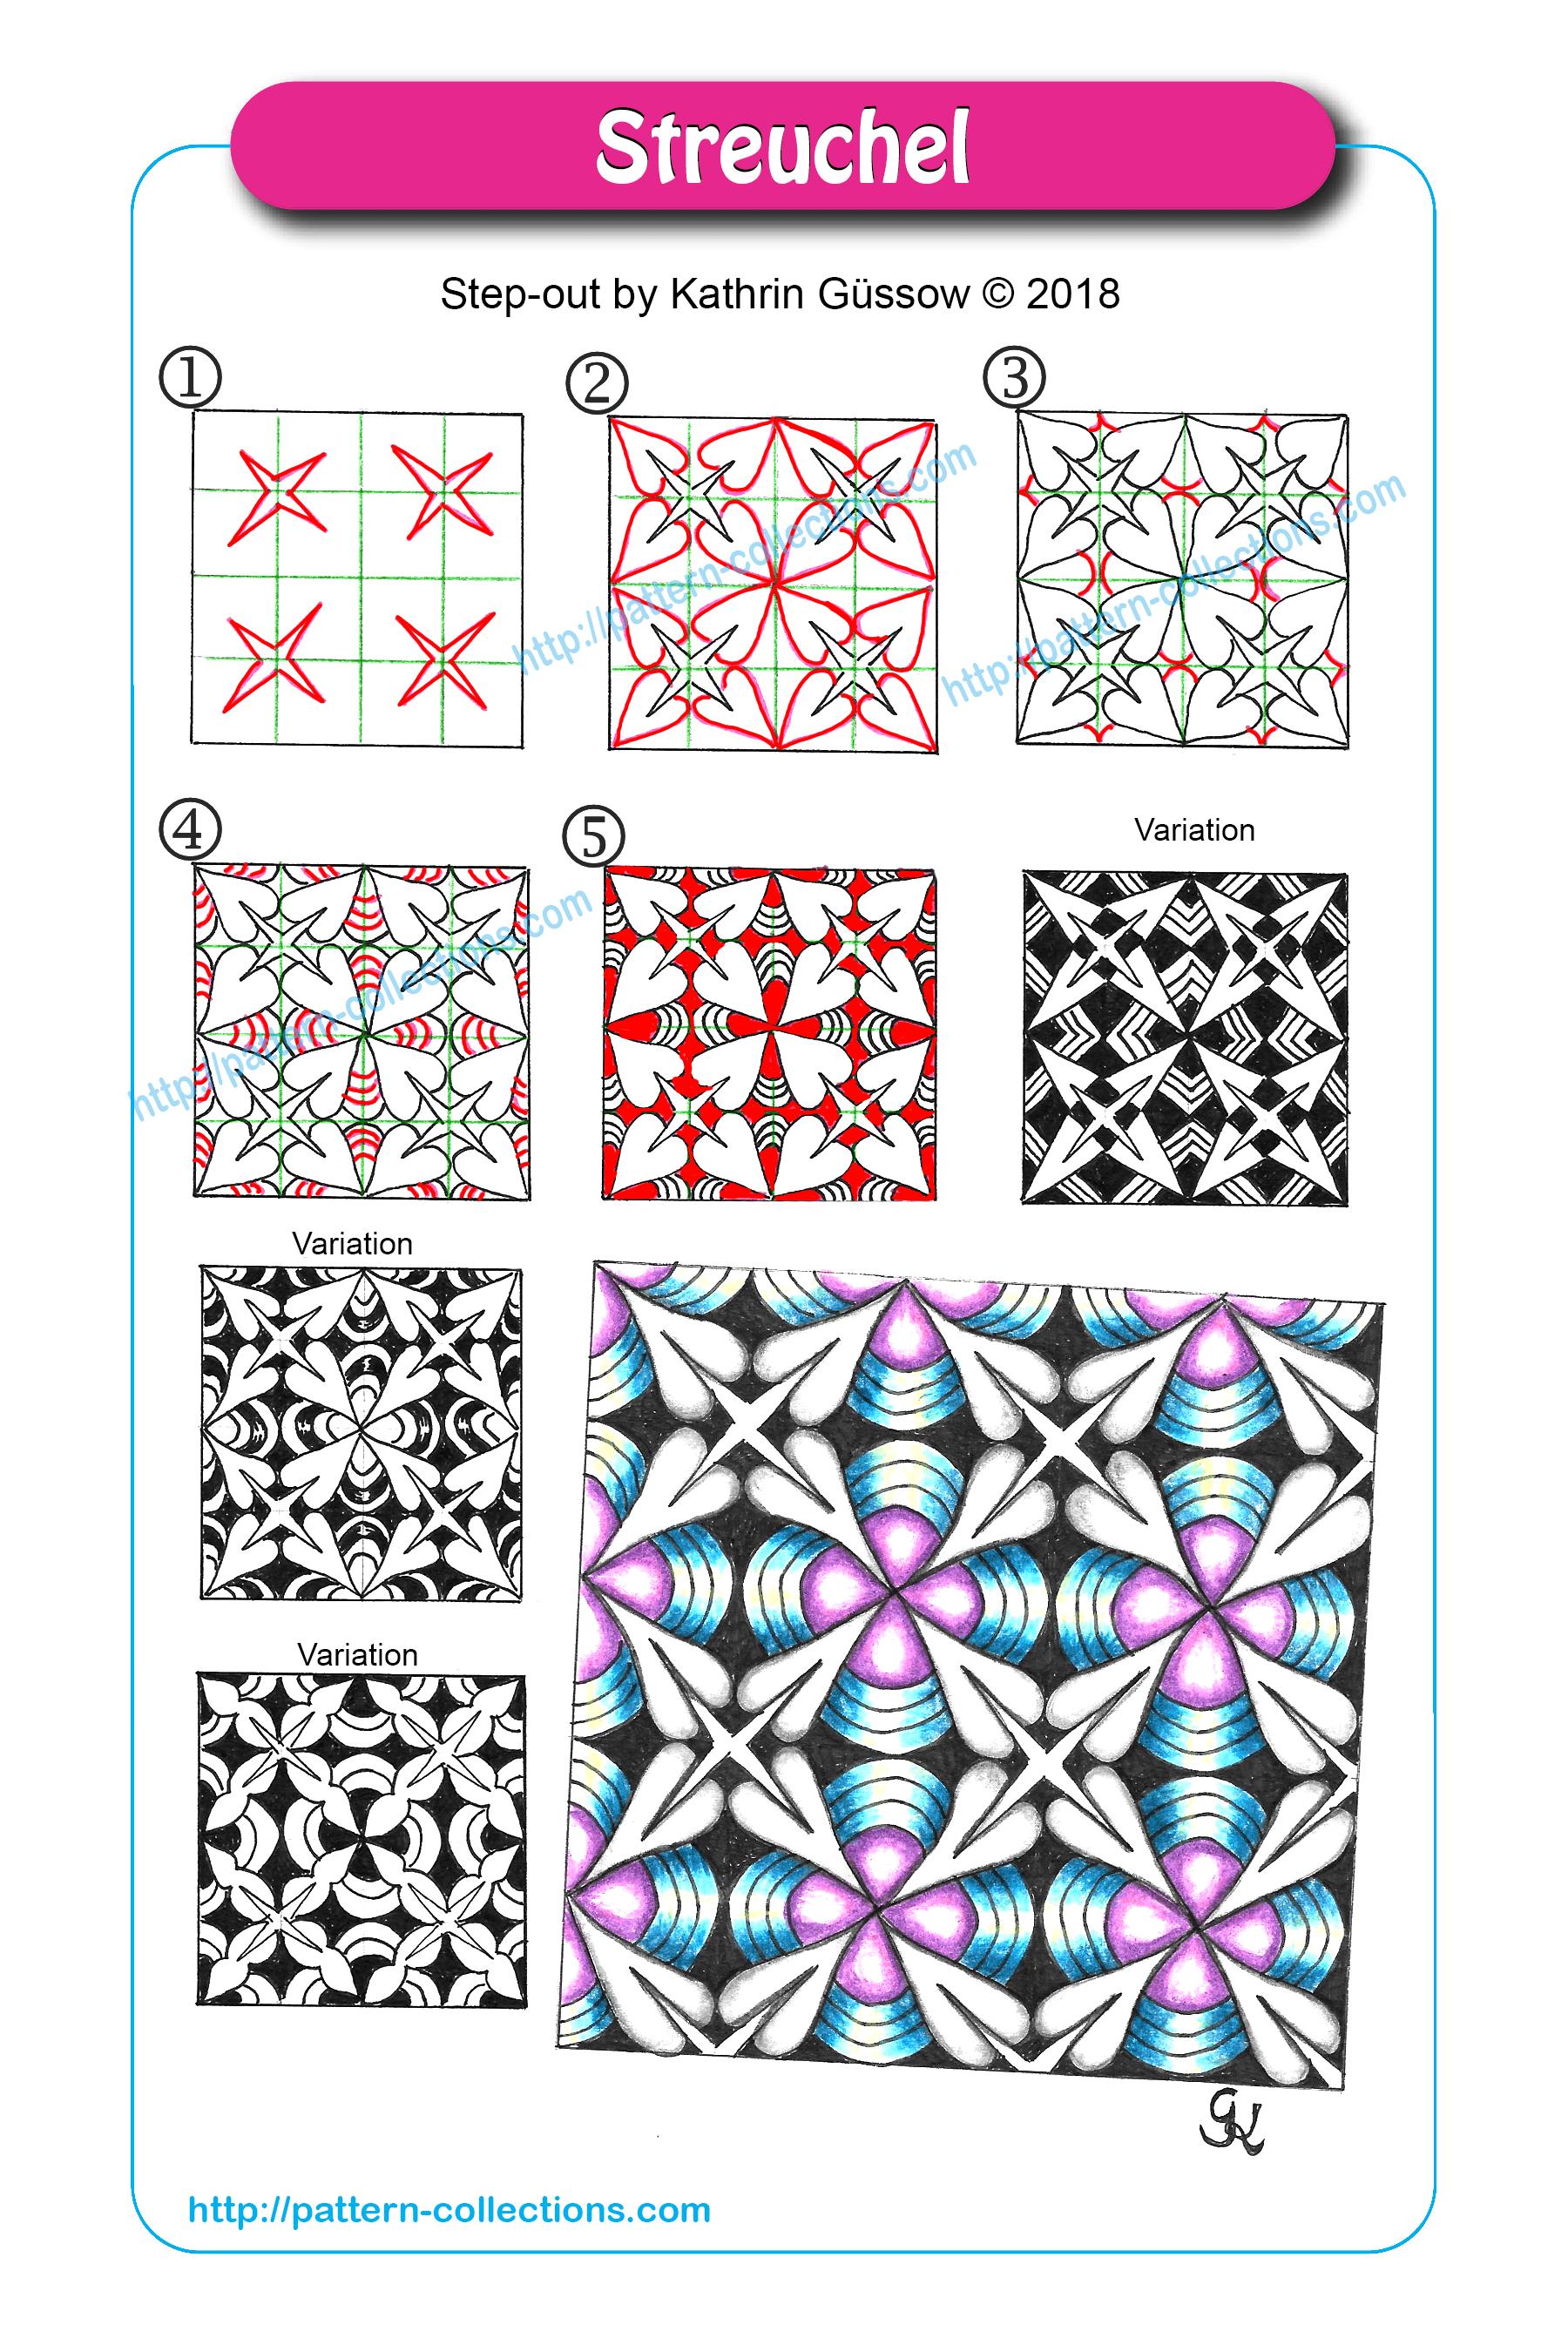 Streuchel By Kathrin Gussow Png 1800 2700 Zentangle Muster Musterkunst Kritzeleien